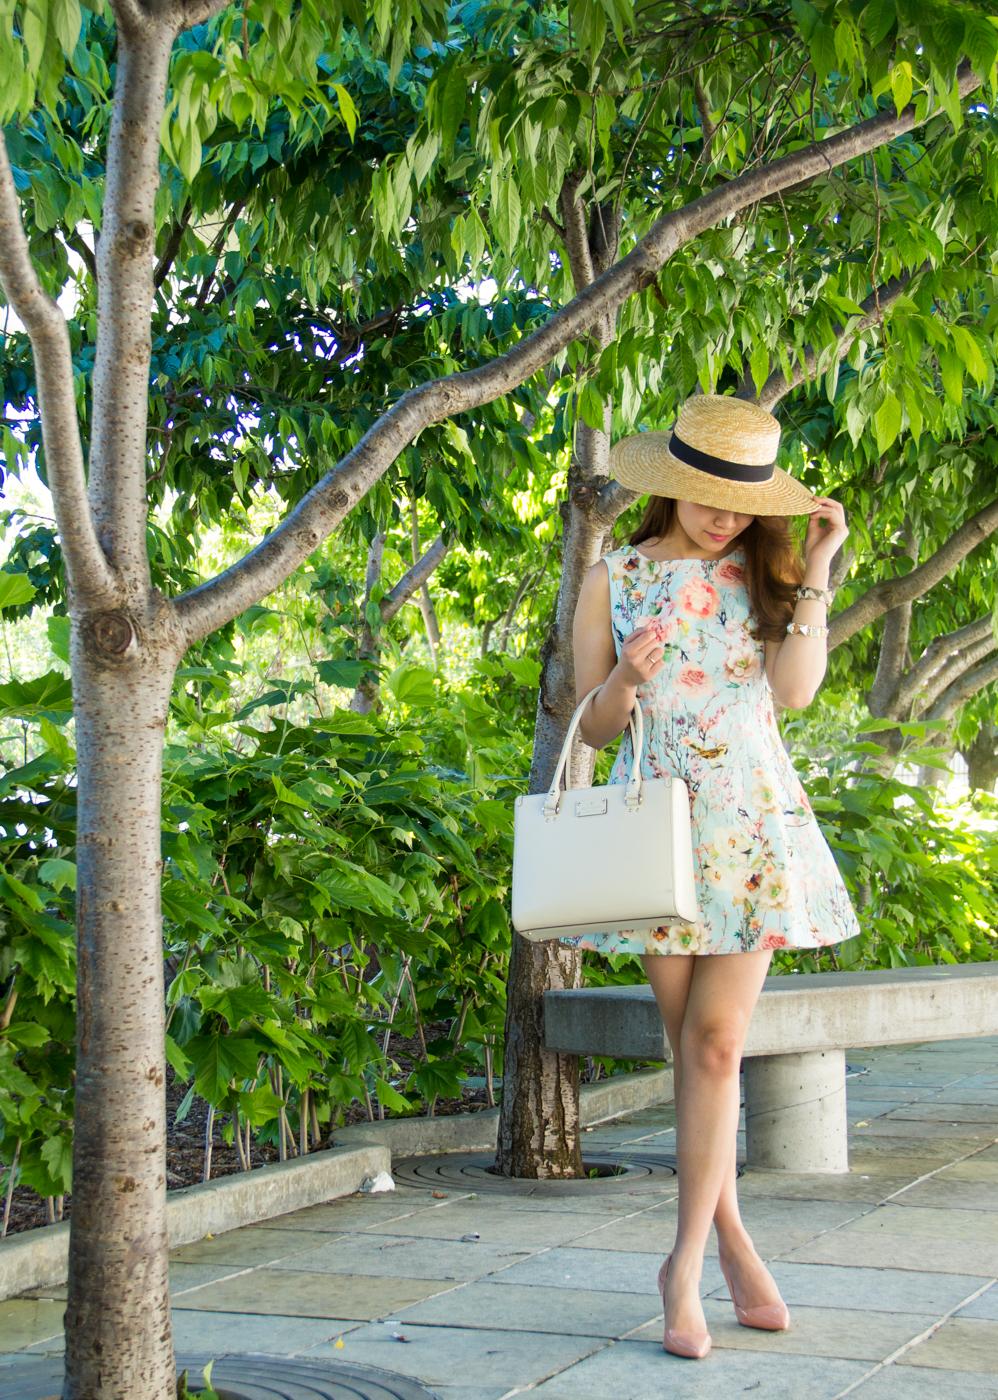 Vacation Vibes | via The Chic Diary